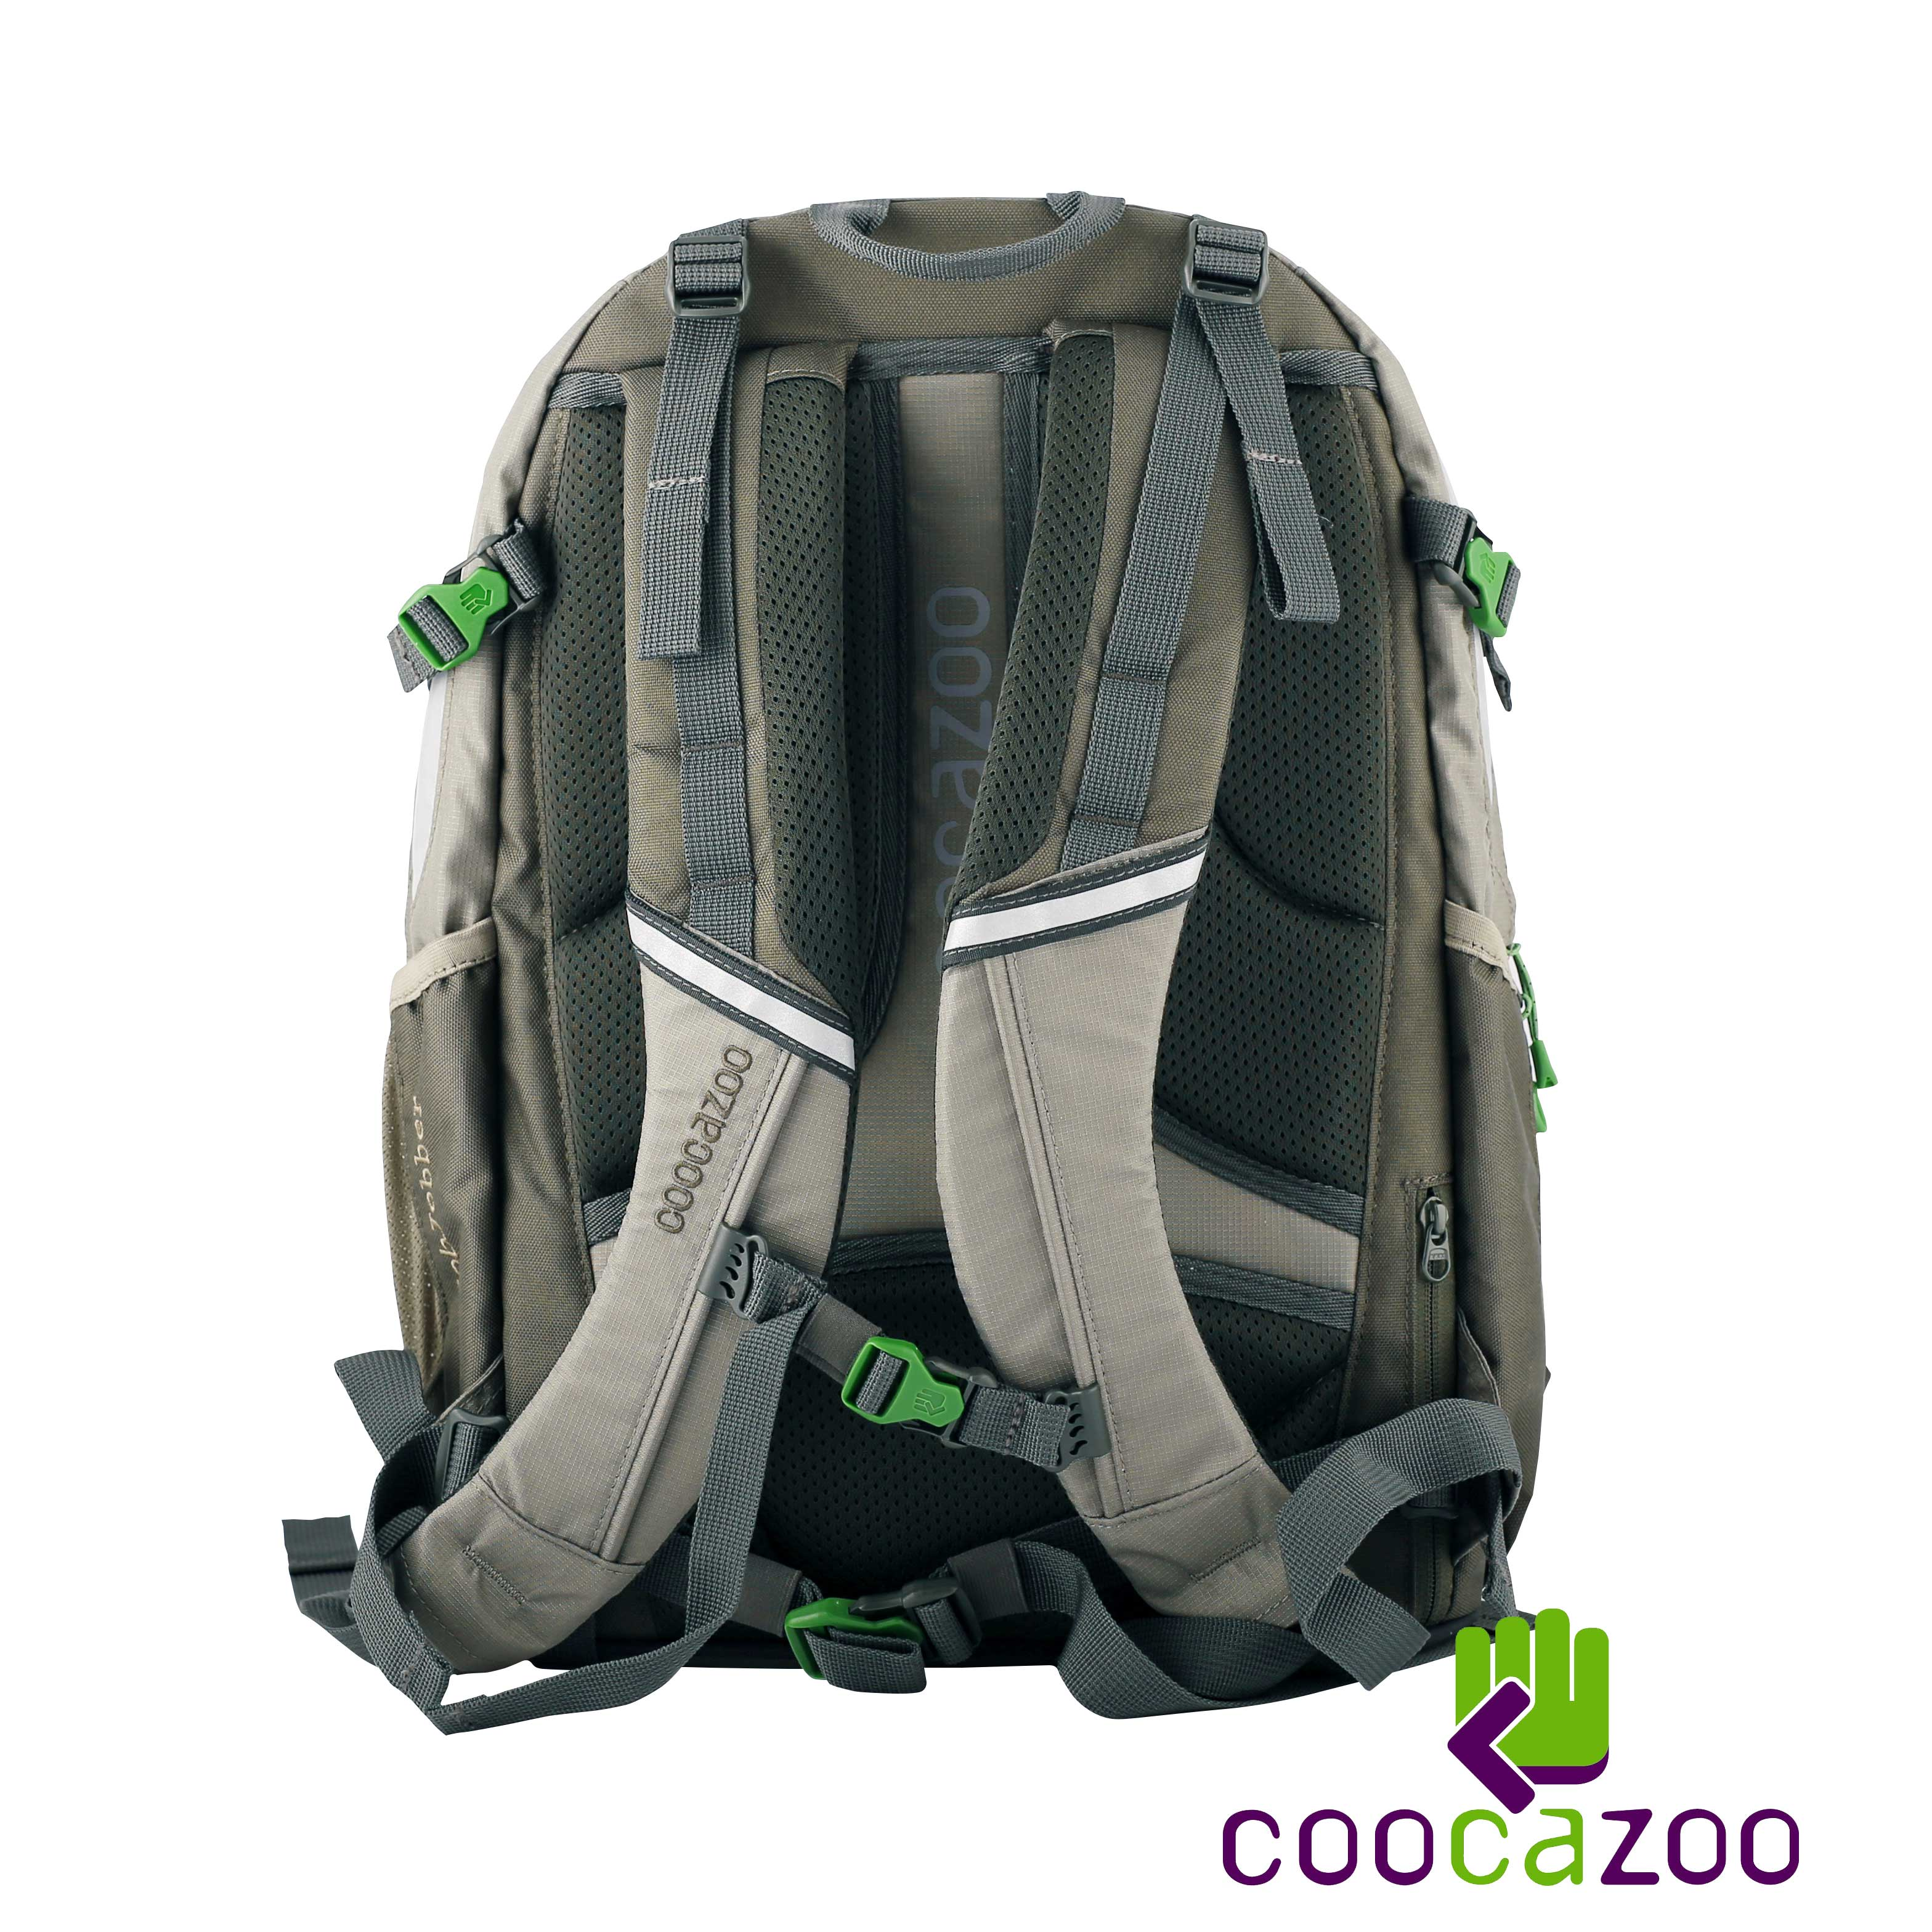 b807732f9d Popis. Školský batoh Coocazoo JobJobber2 Solid ...